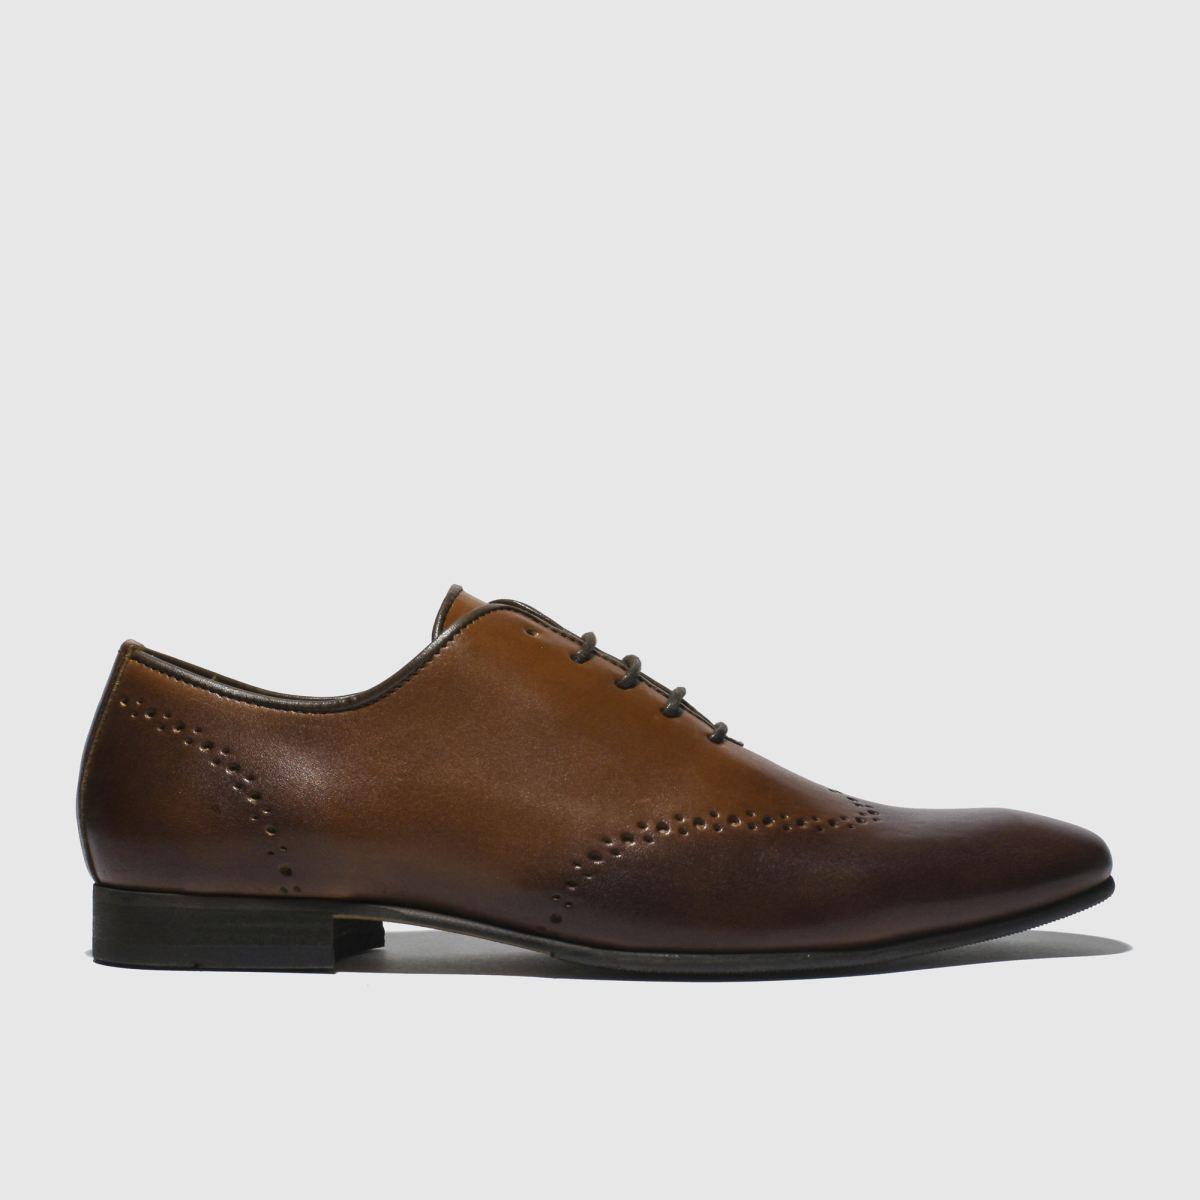 Schuh Tan Winkworth Clean Brogue Shoes